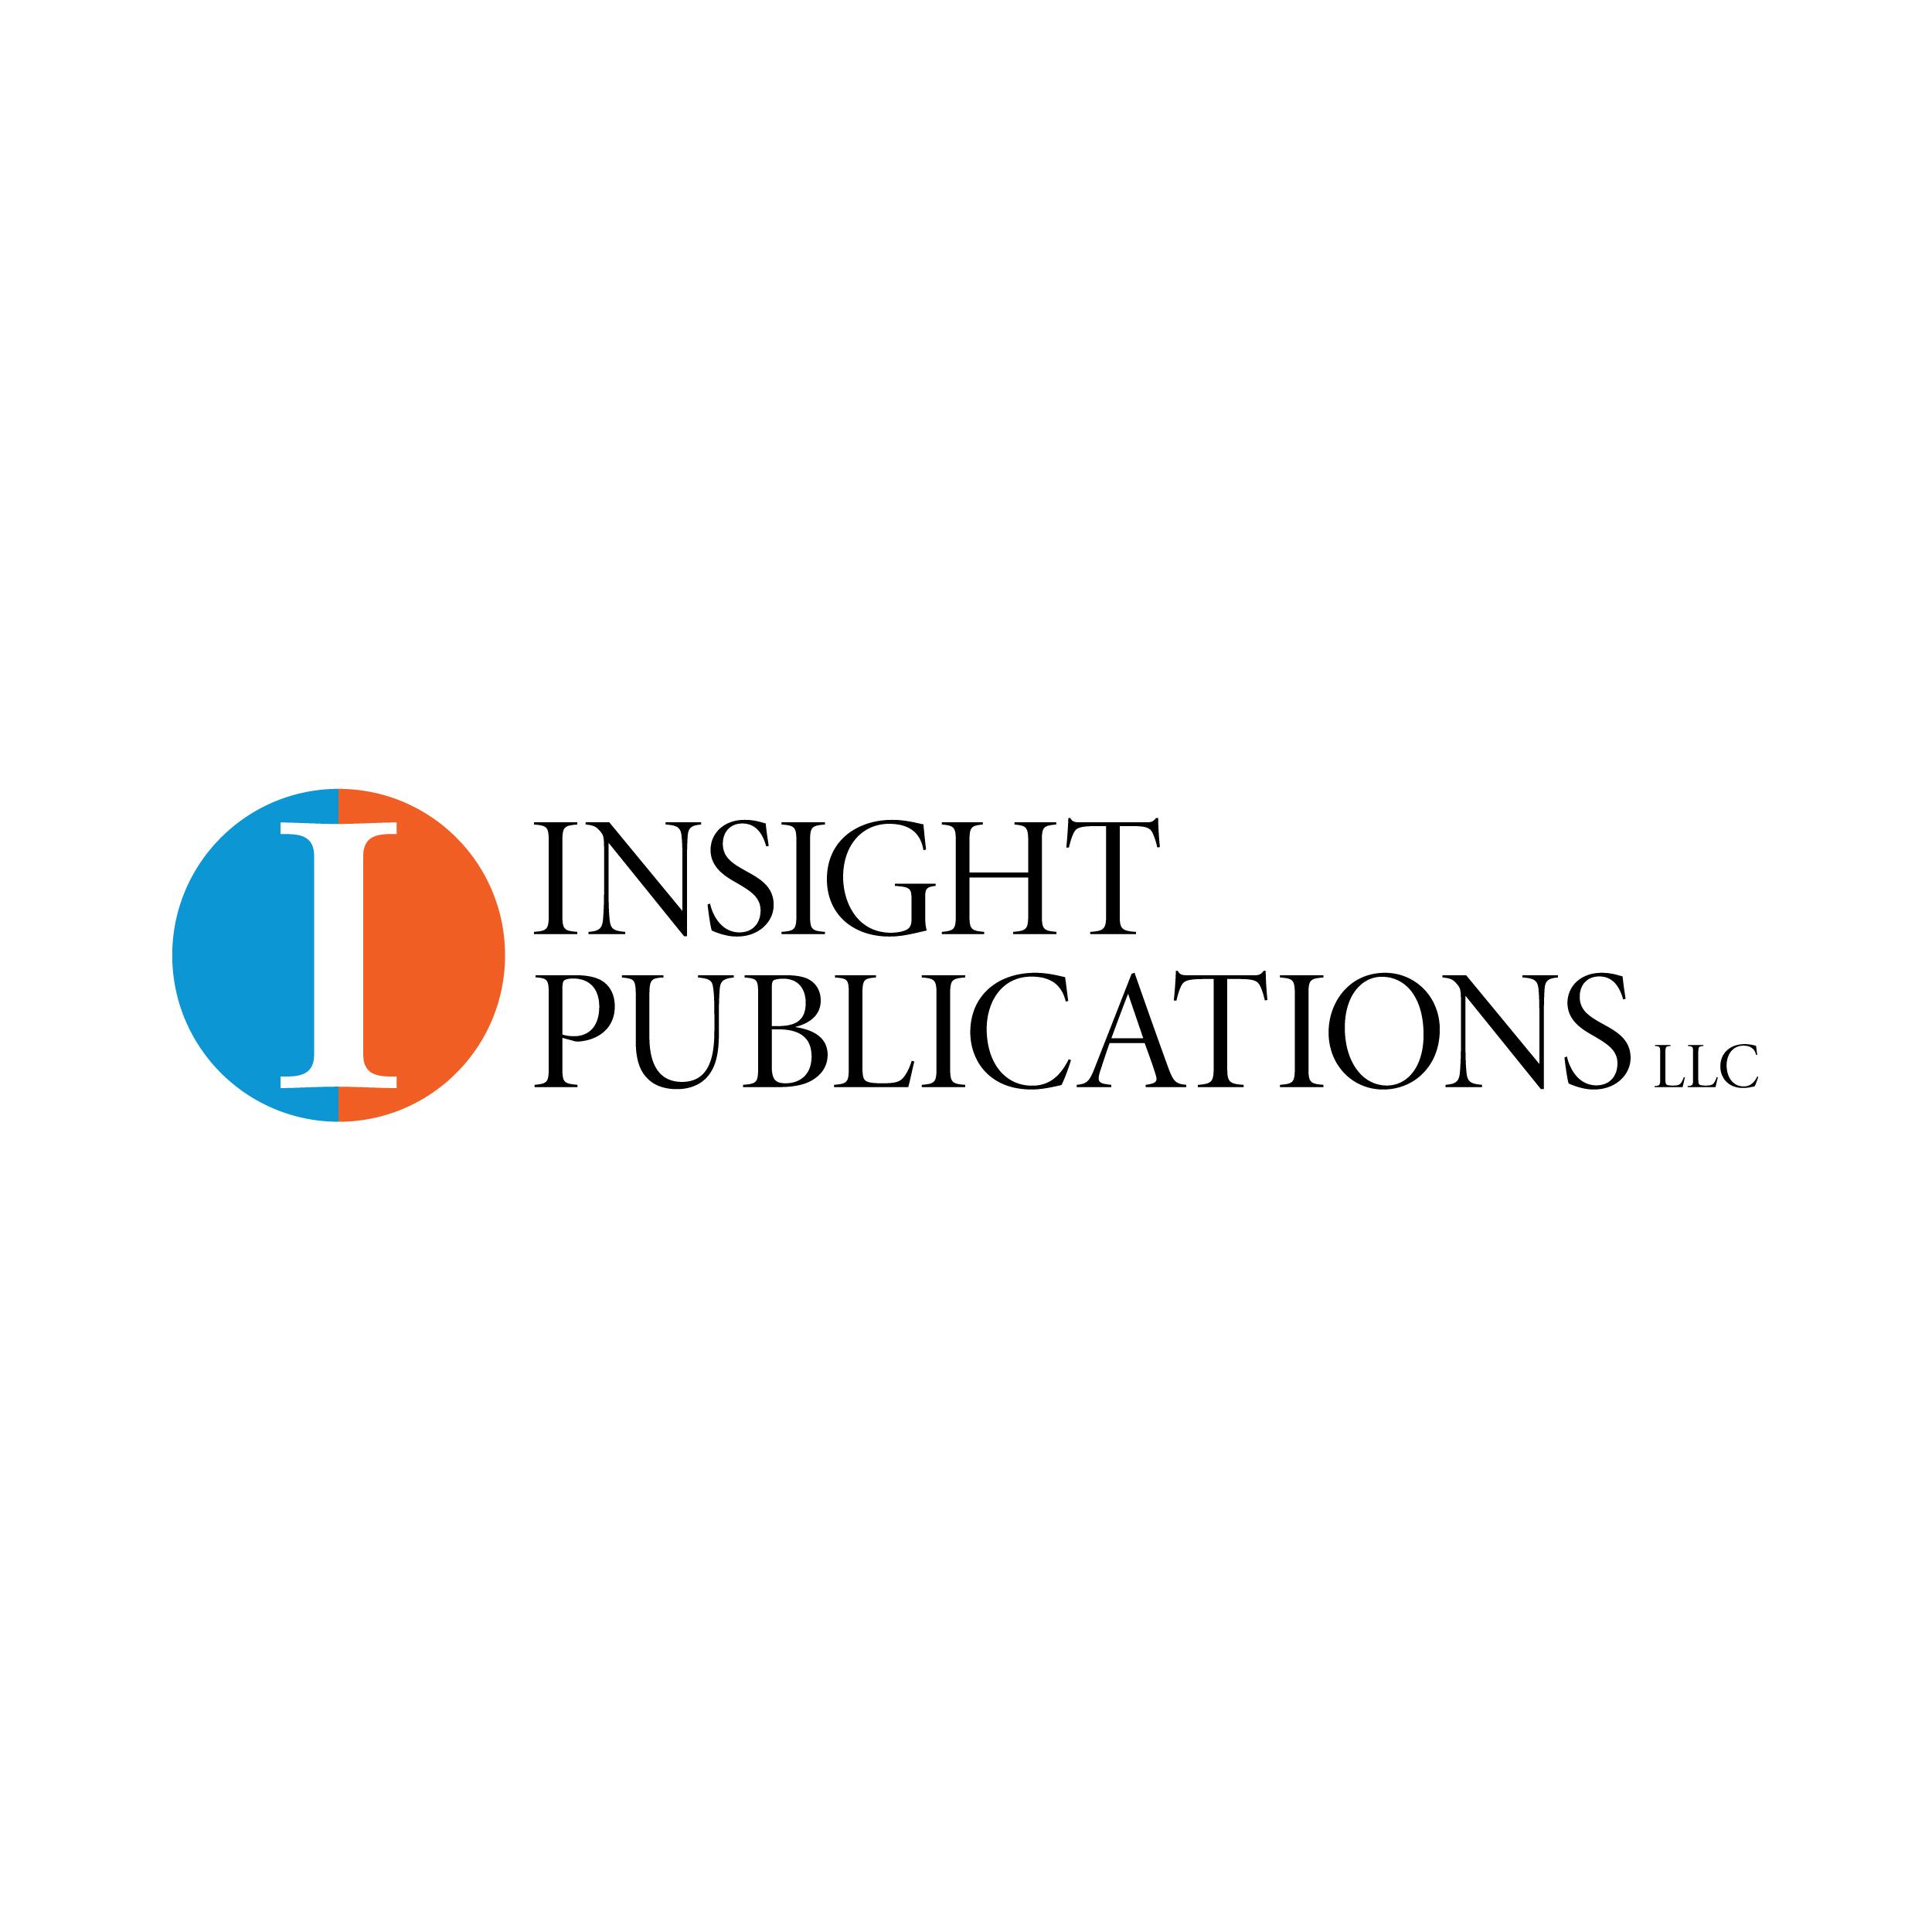 InsightPublications_logo_rgb_2500px.jpg